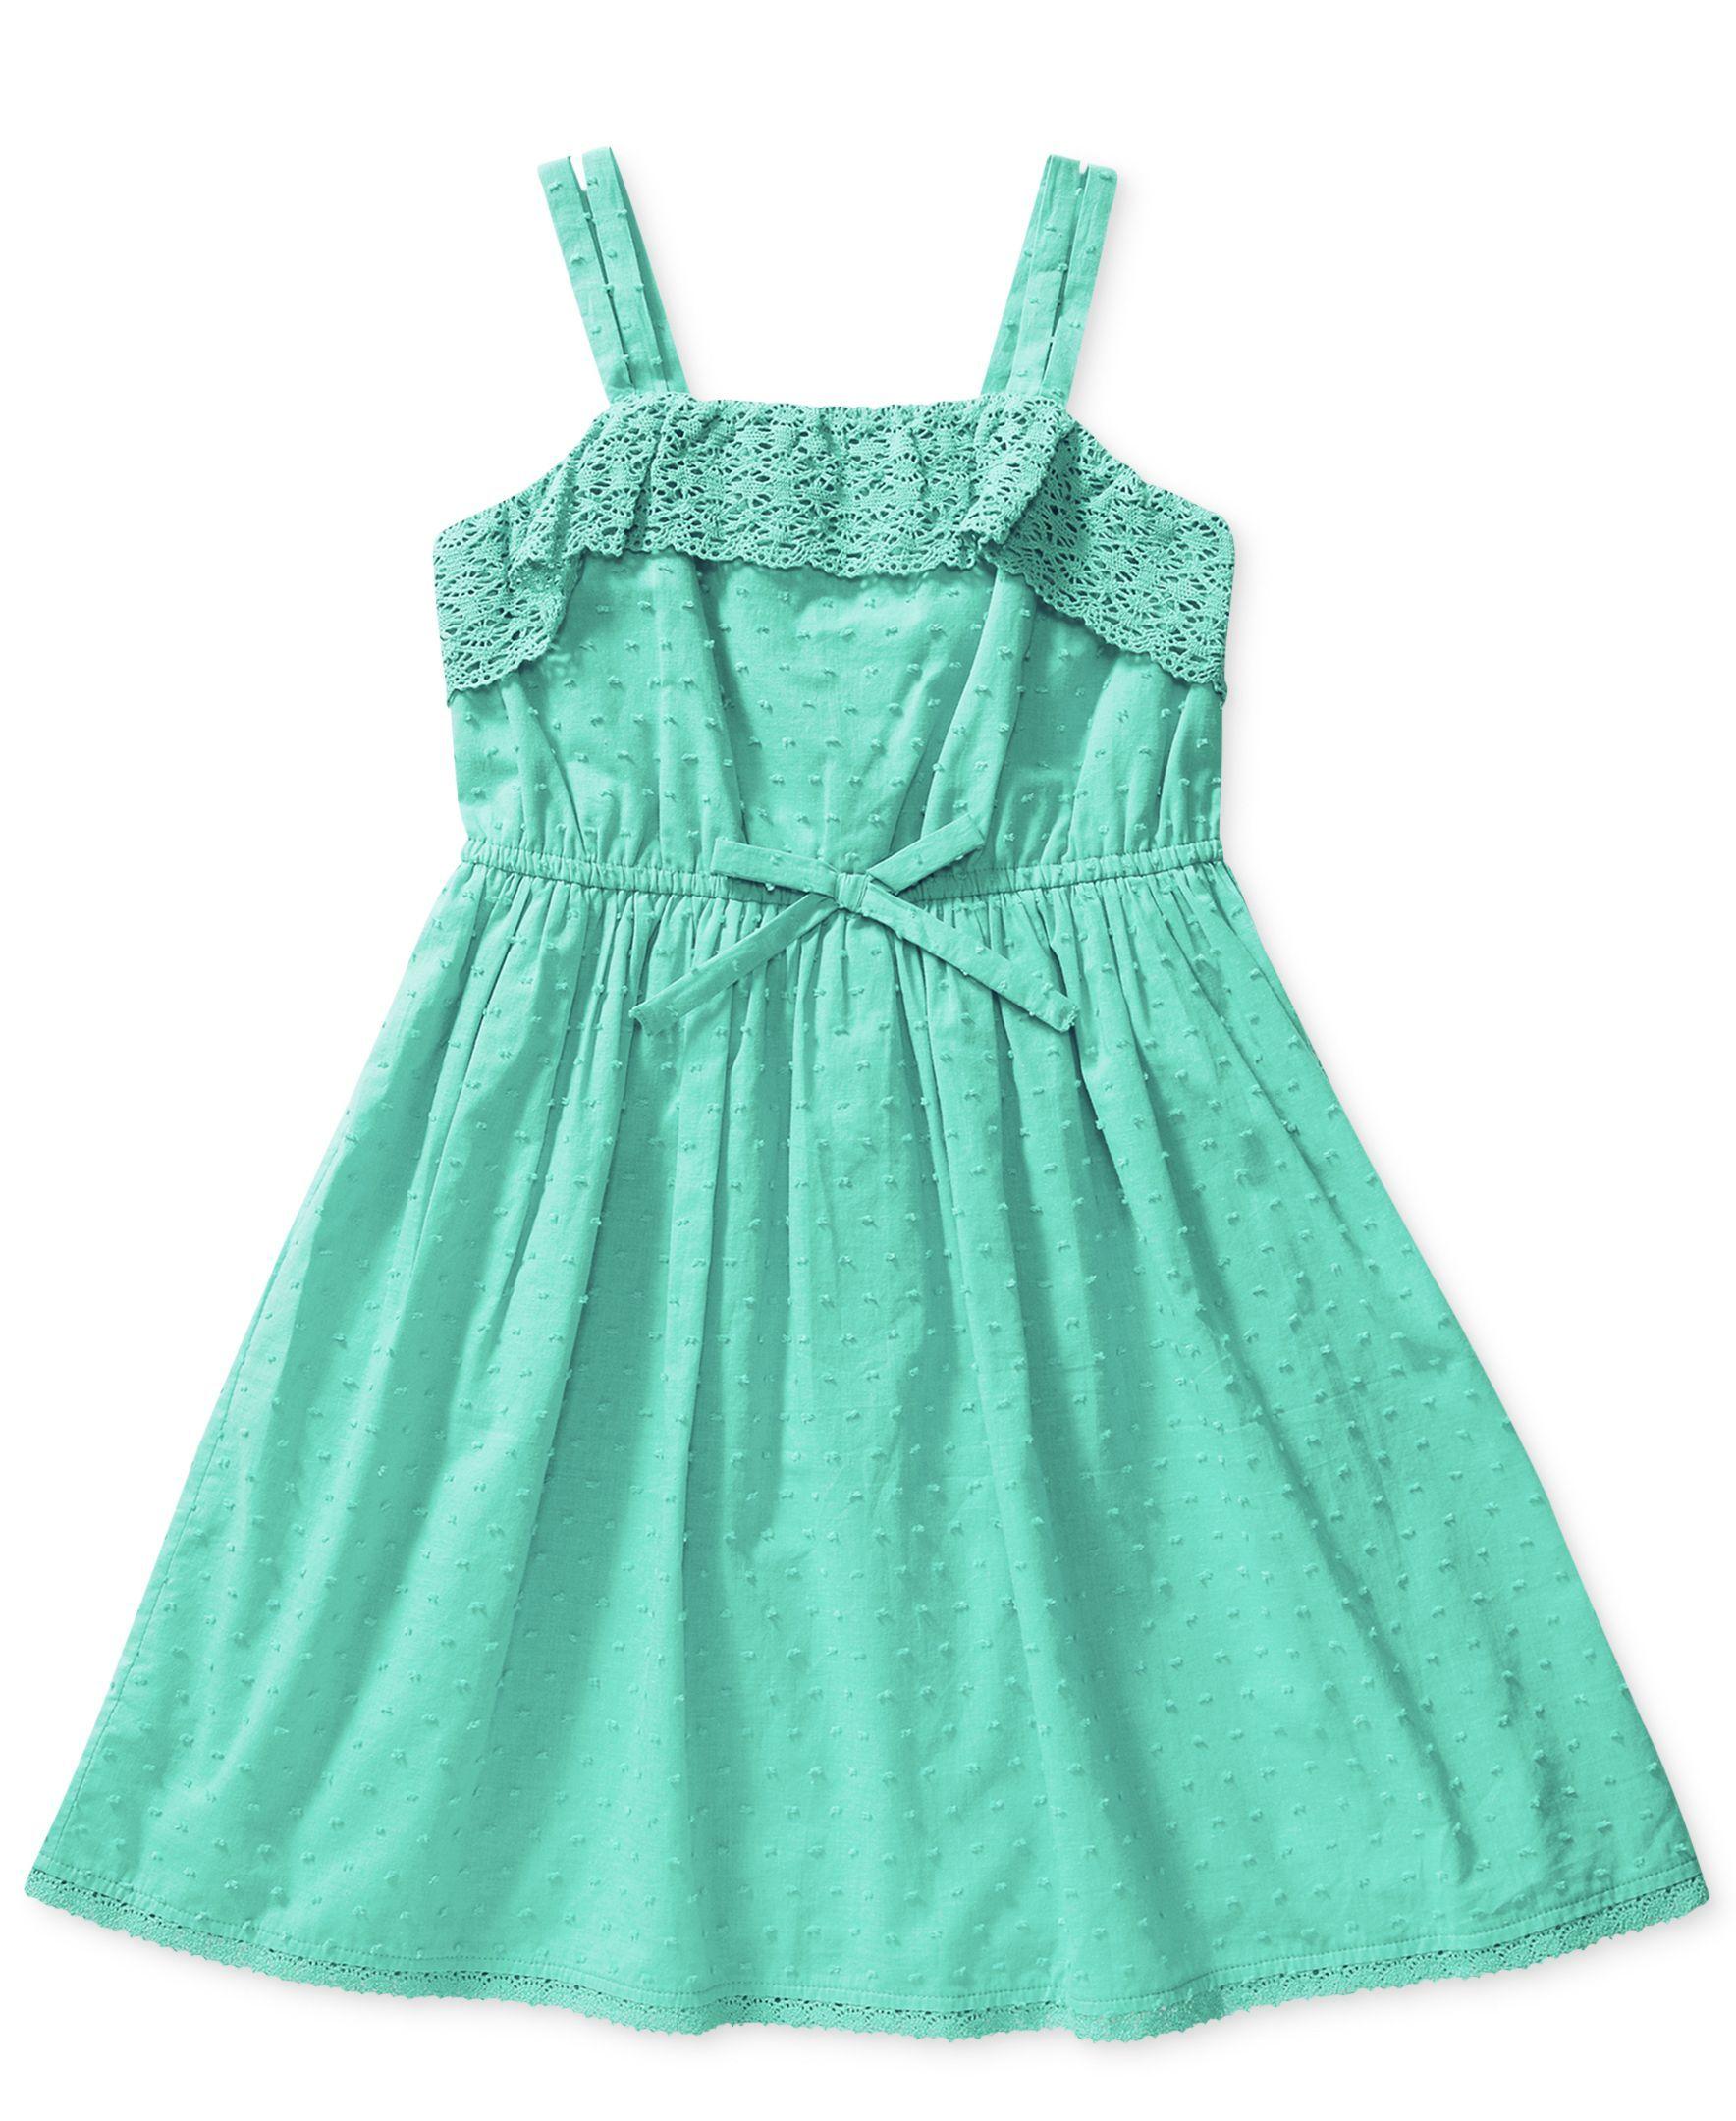 Bloome Girls' Crochet-Trim Dress